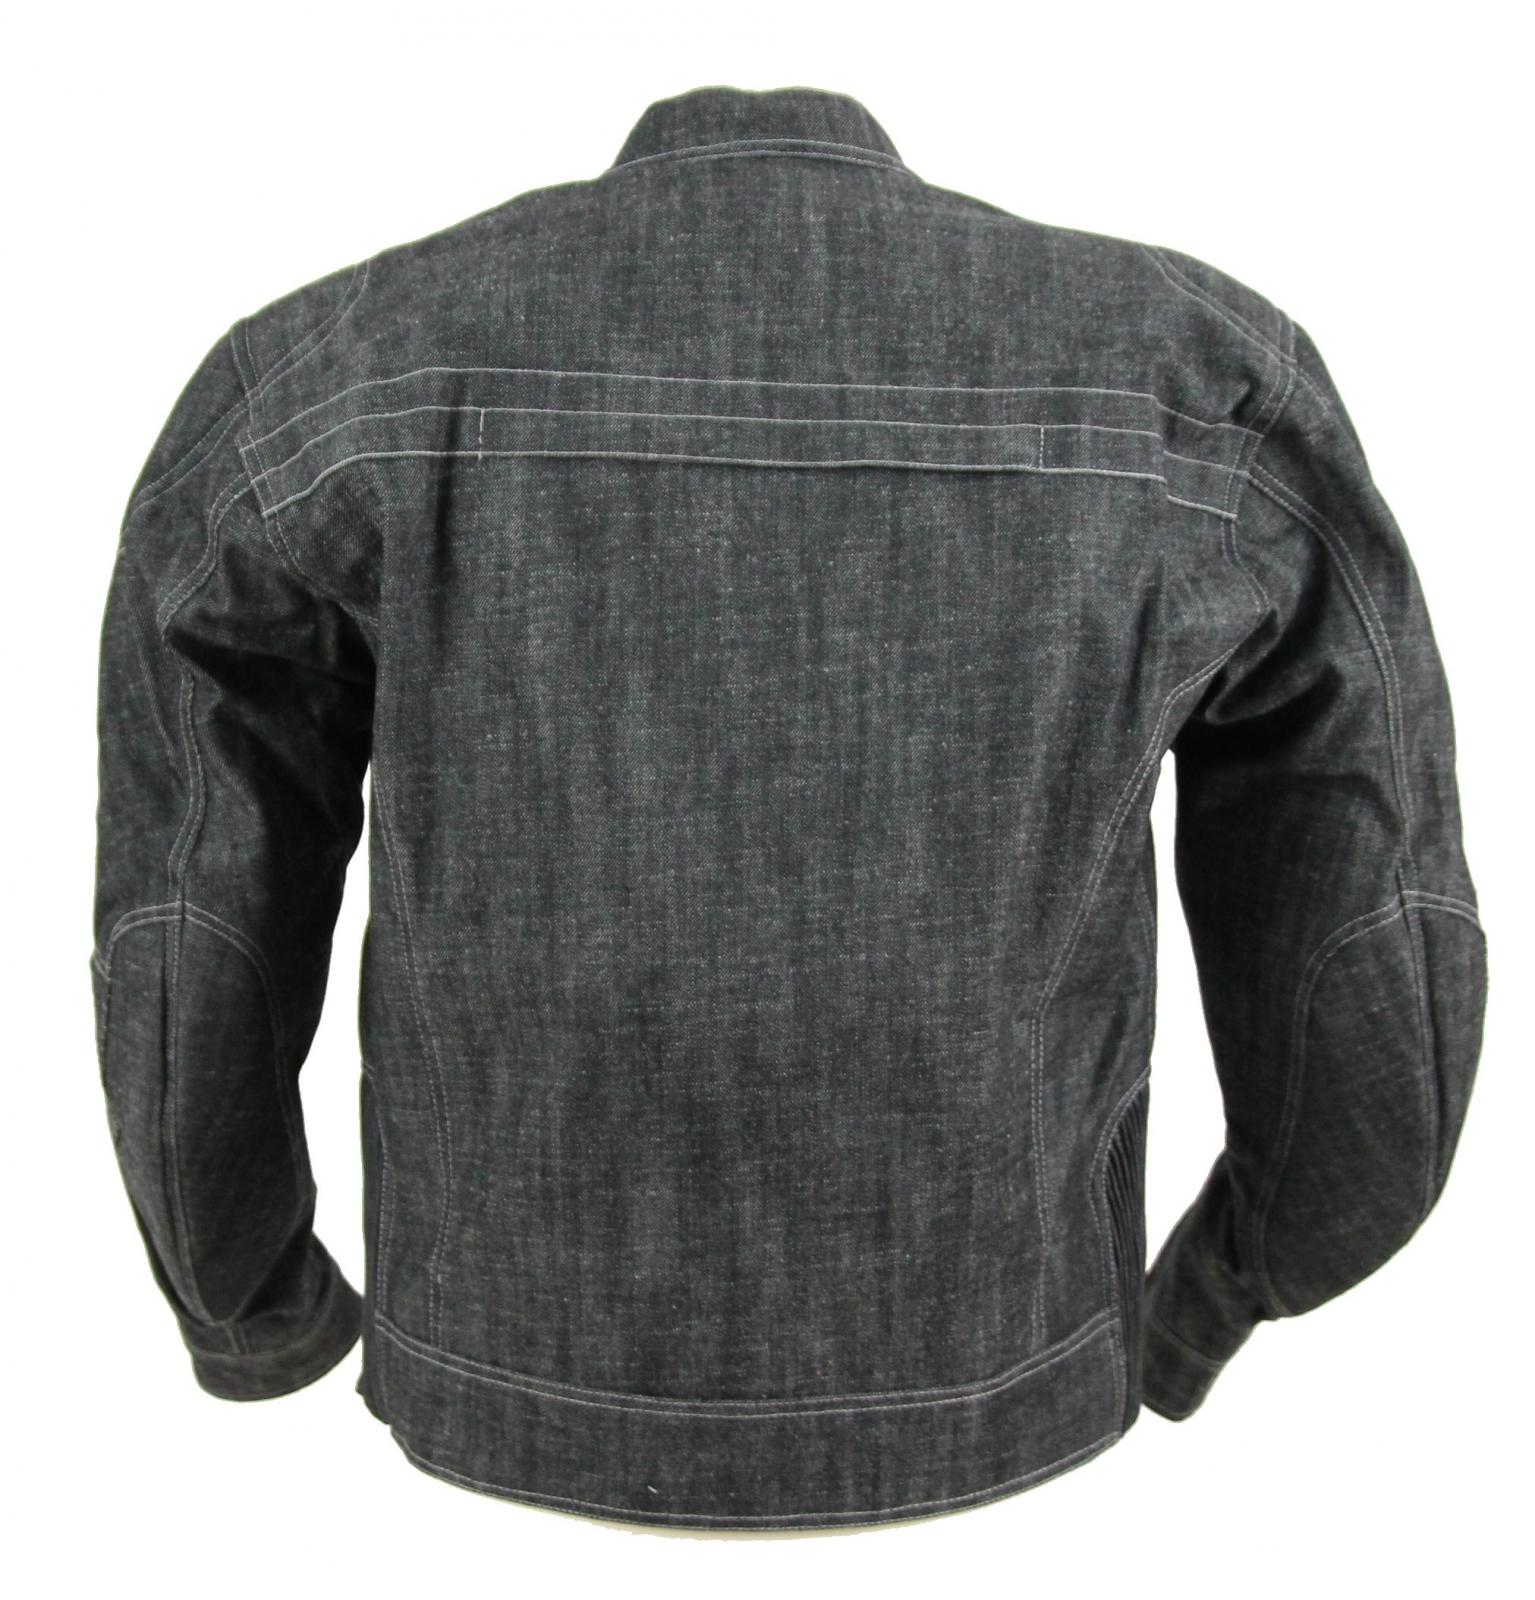 kt006 blouson moto en jean 39 s denim noir gris karno protections moto amovibles. Black Bedroom Furniture Sets. Home Design Ideas